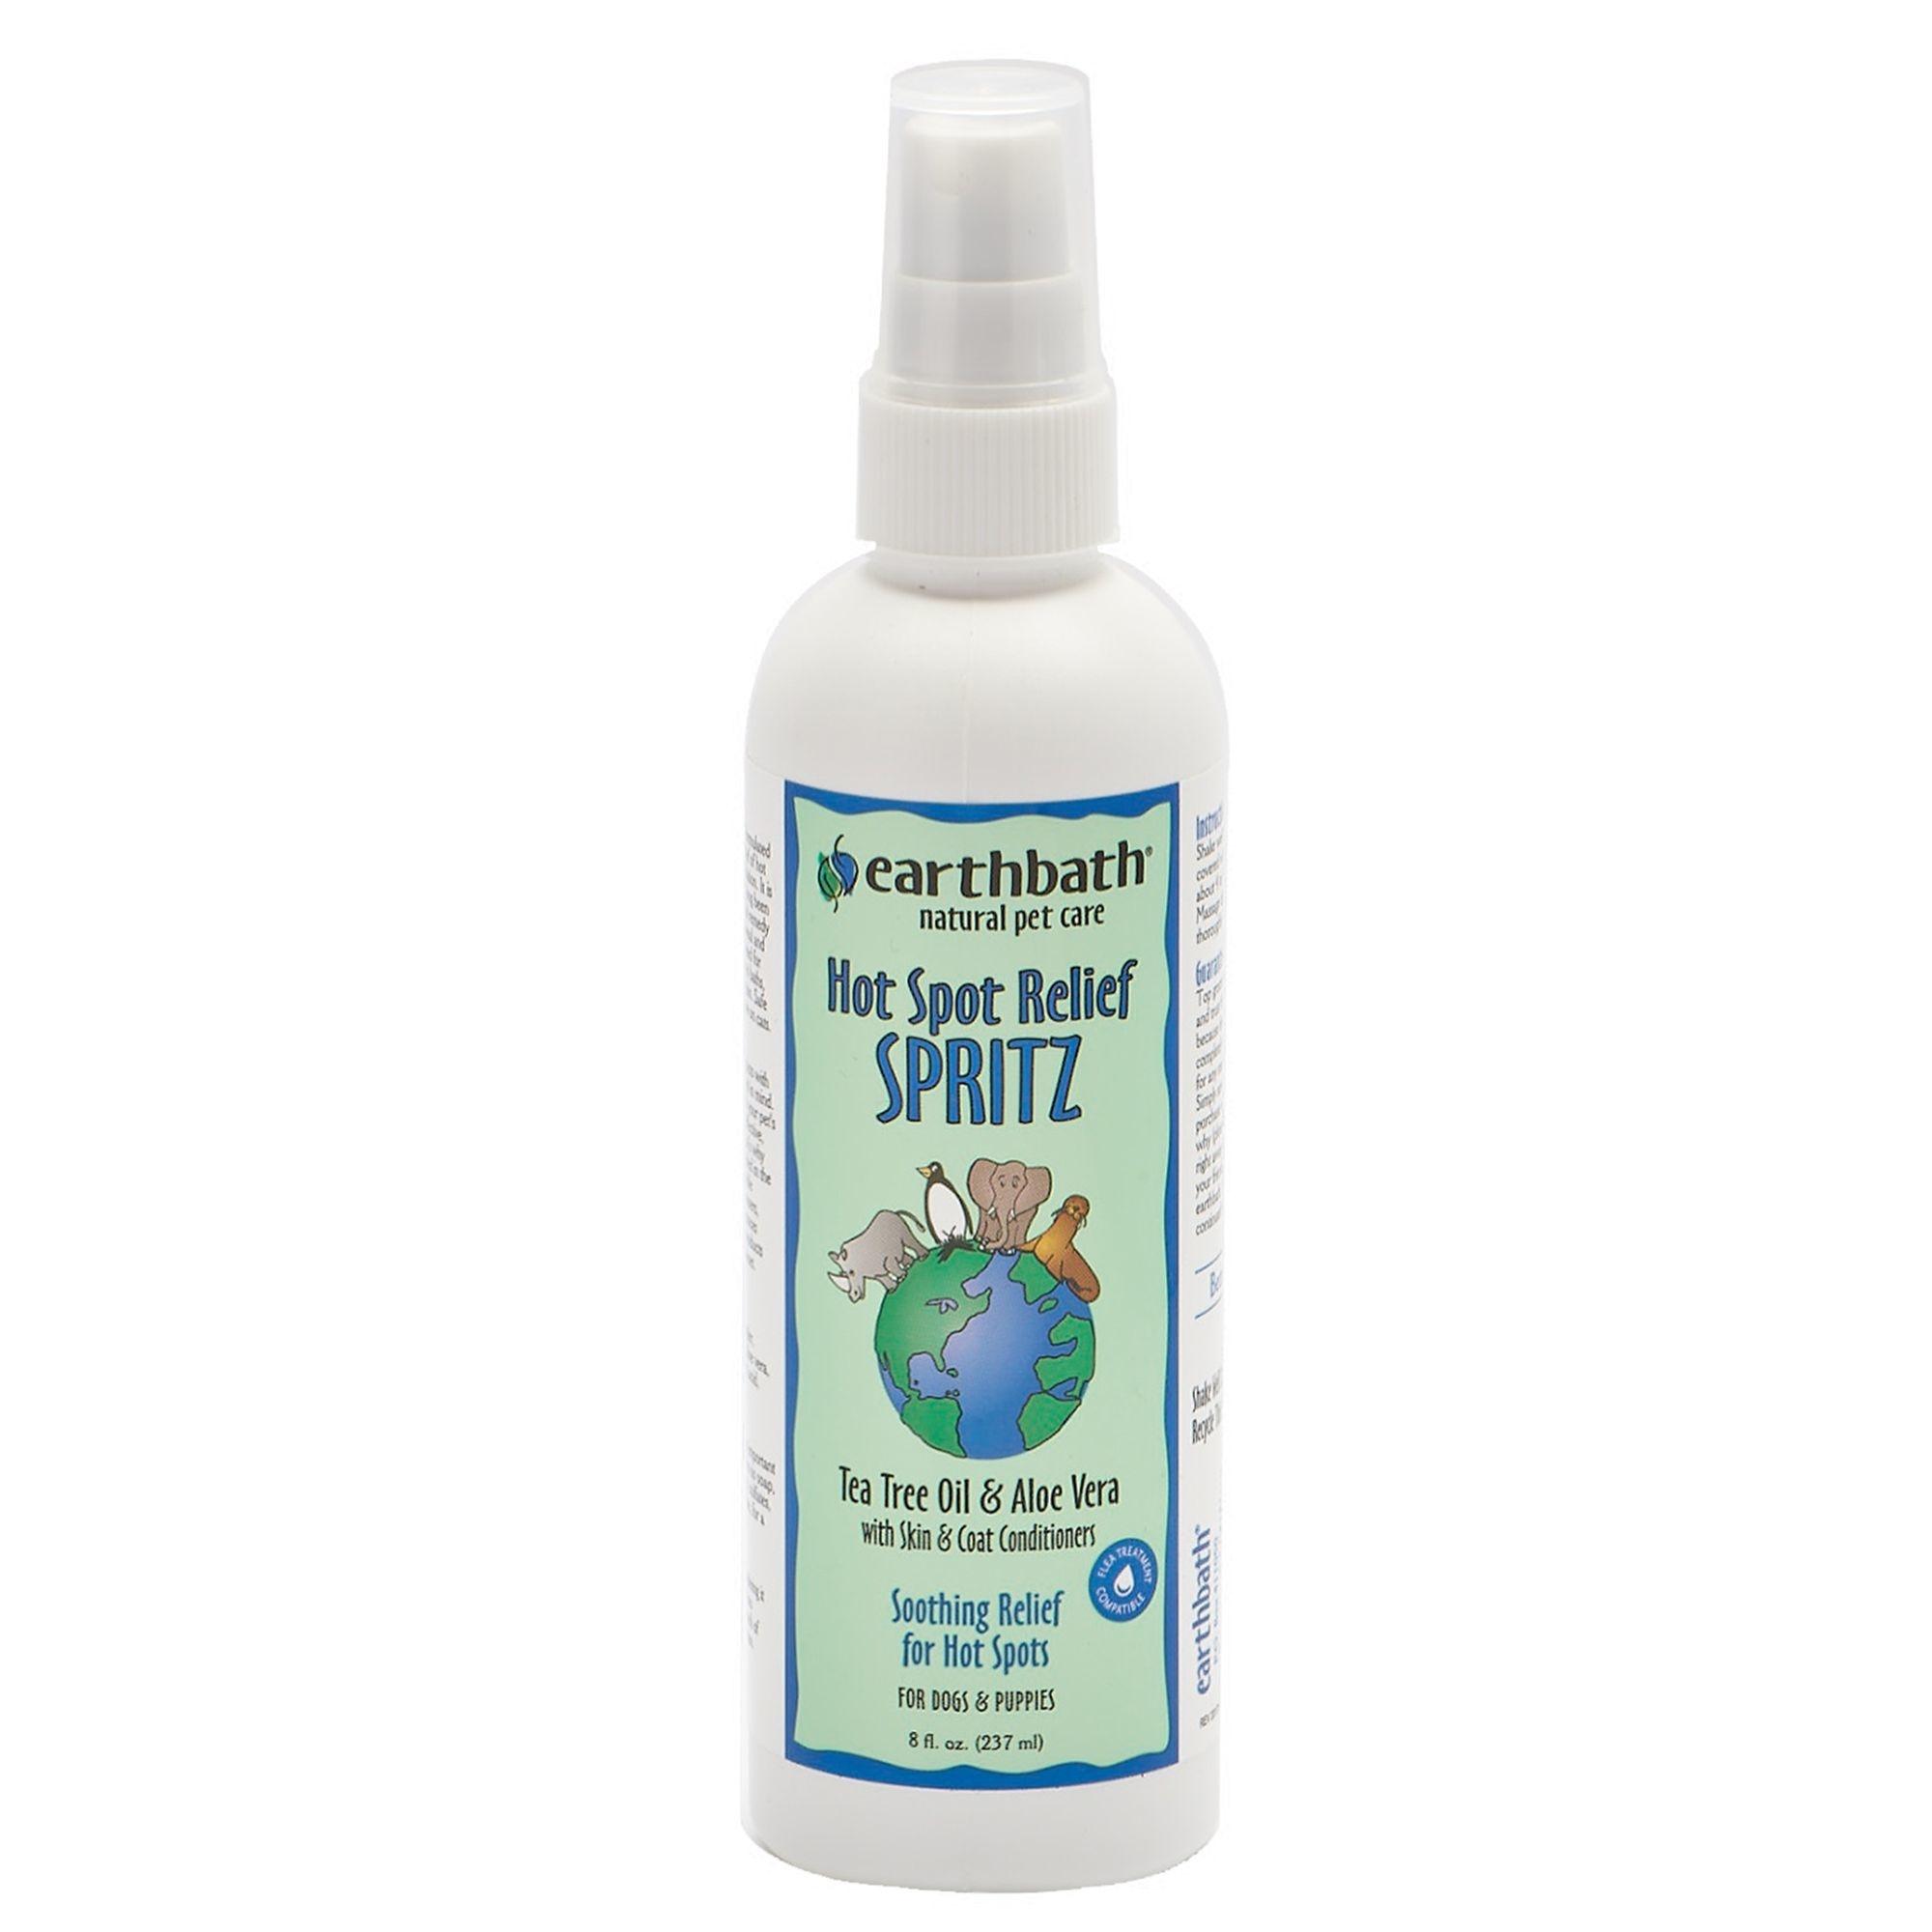 Earthbath Earthbath 3-in-1 Hot Spot Relief Tea Tree & Aloe Spritz 8oz